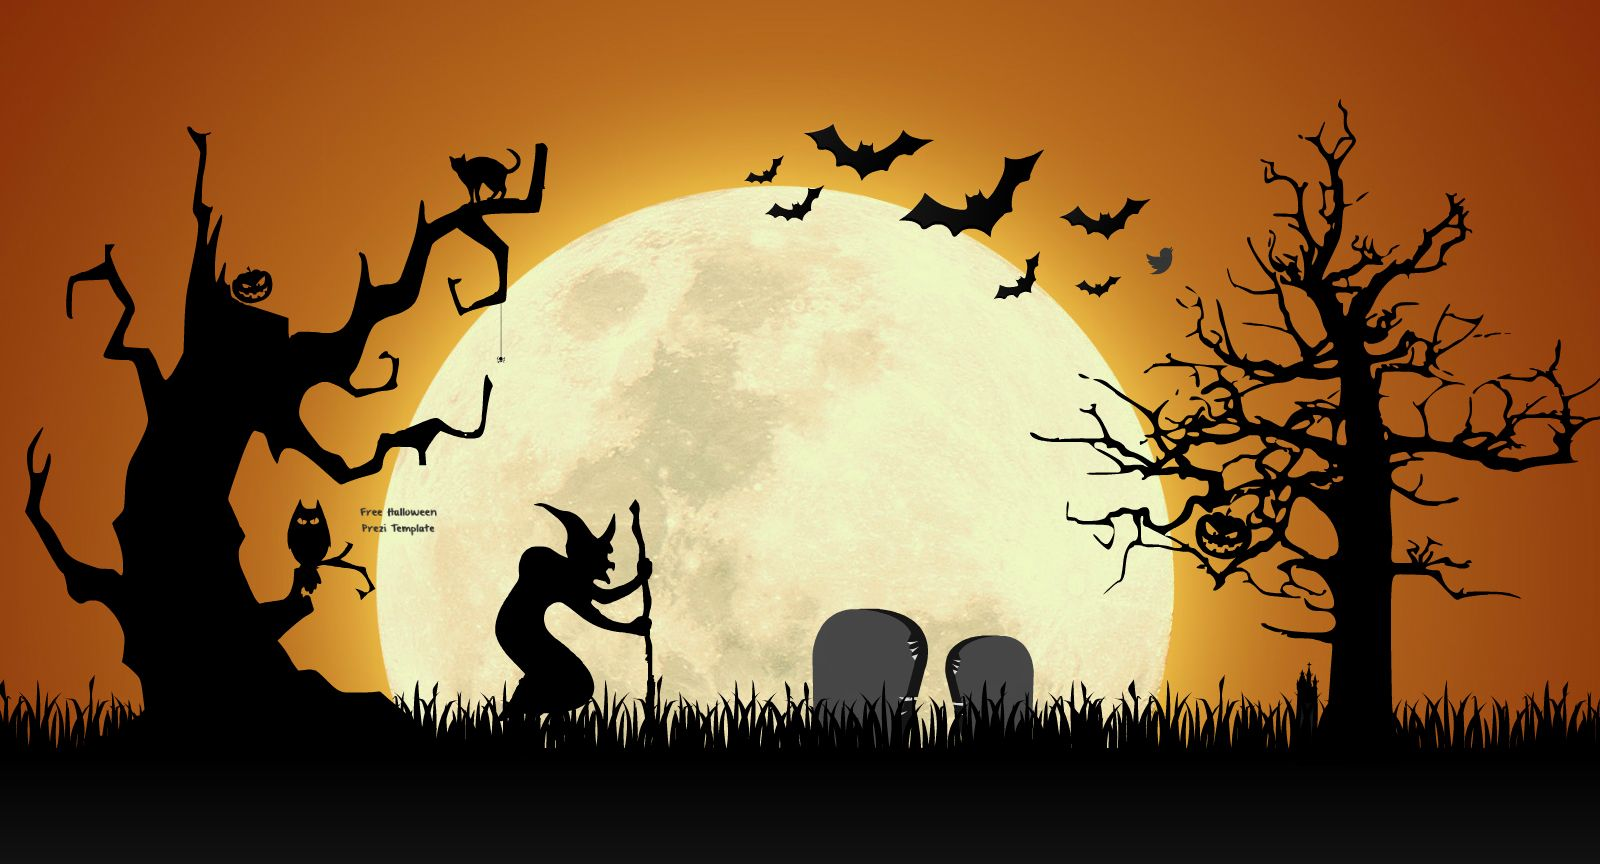 Free Halloween Themed Prezi Template Various Halloween Elements